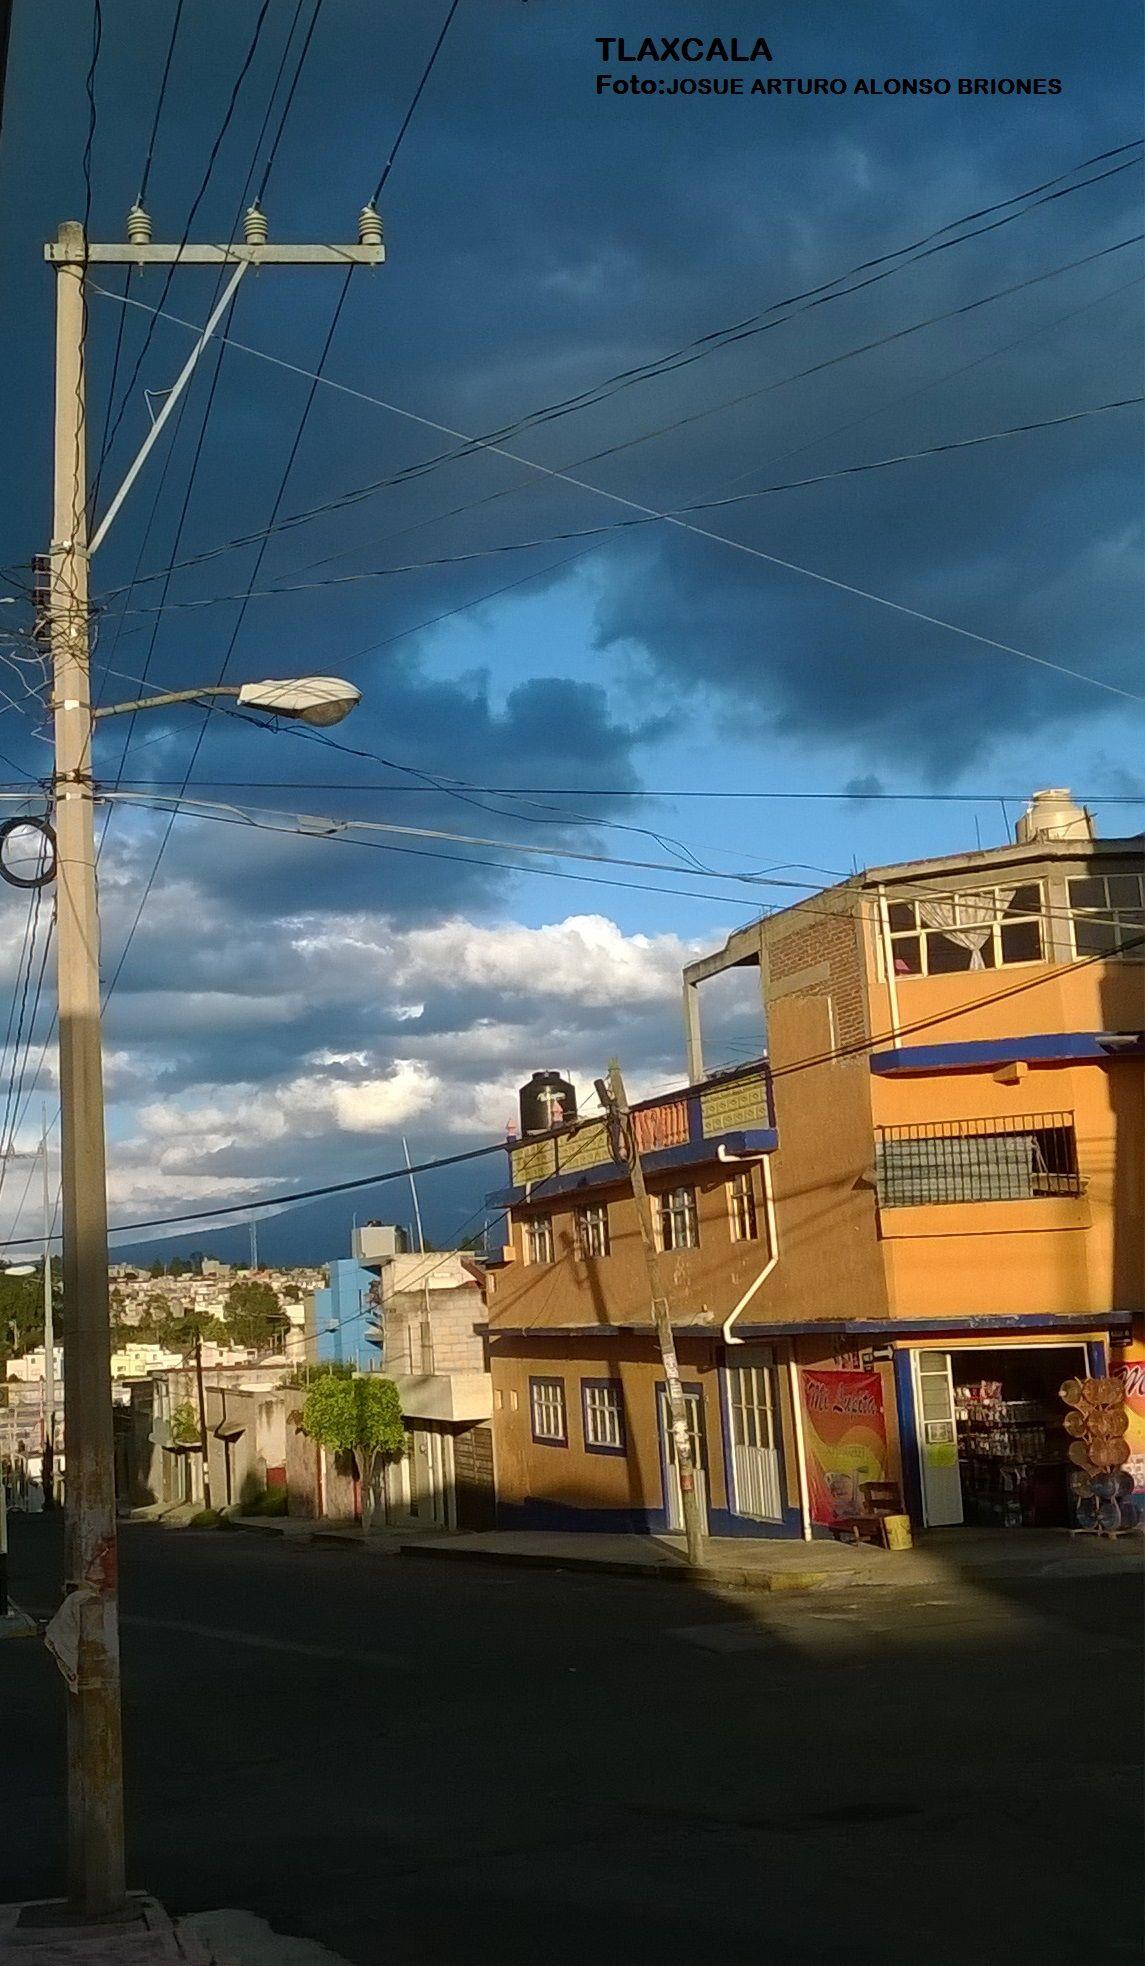 La loma Xicohtencatl Tlaxcala